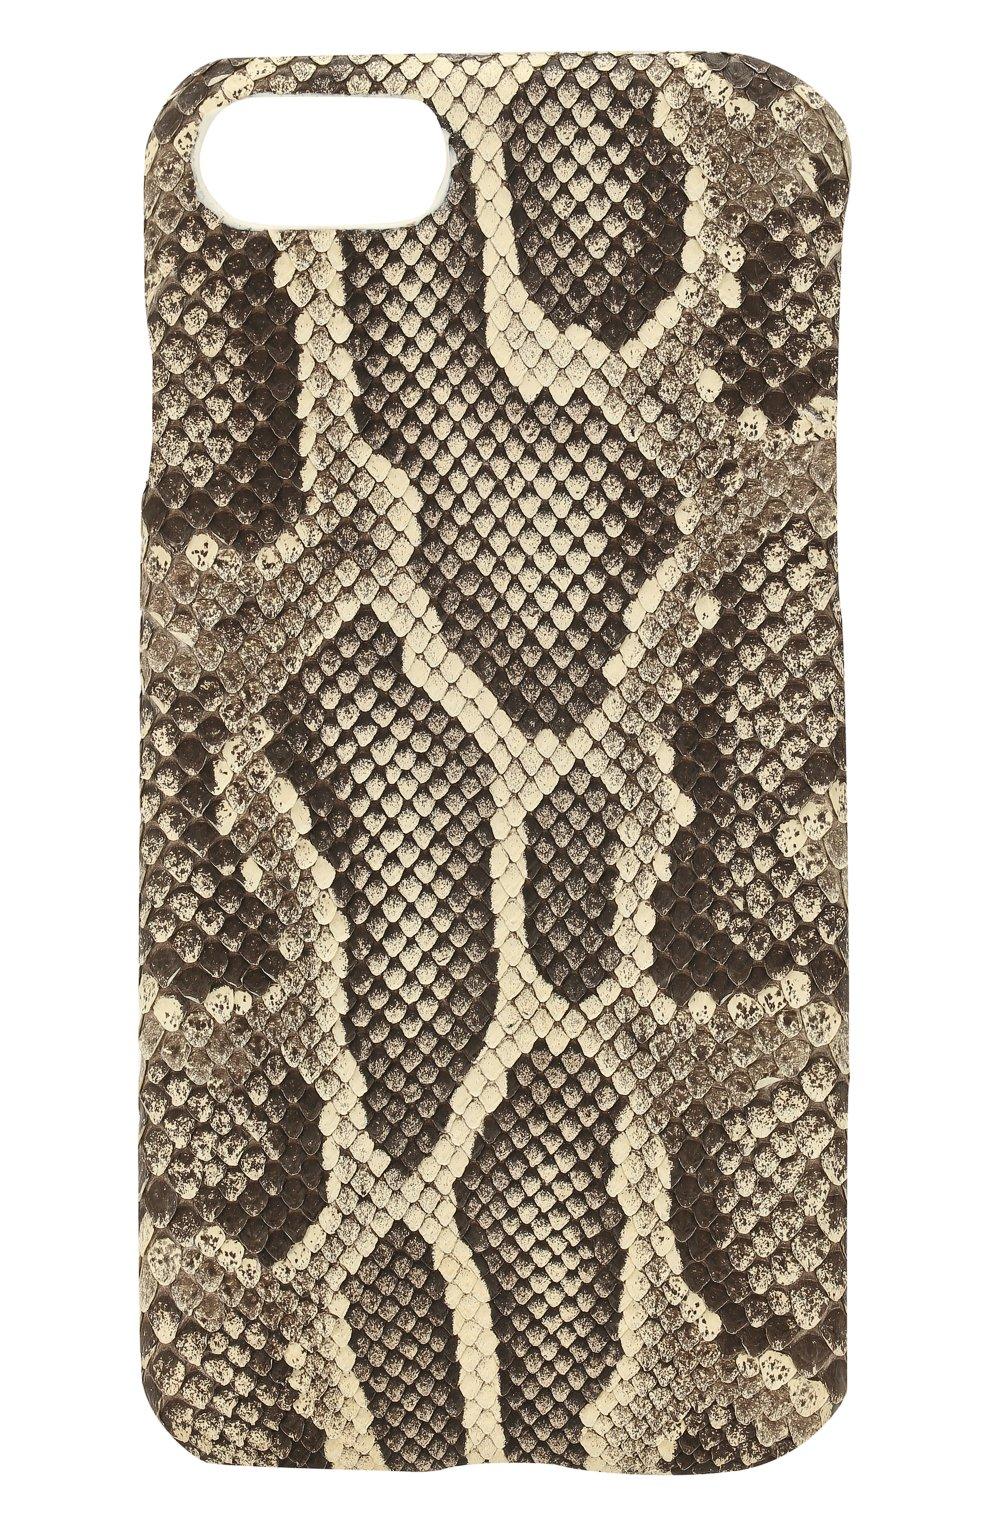 Чехол для iPhone 7/8 из кожи питона Hadoro  | Фото №1